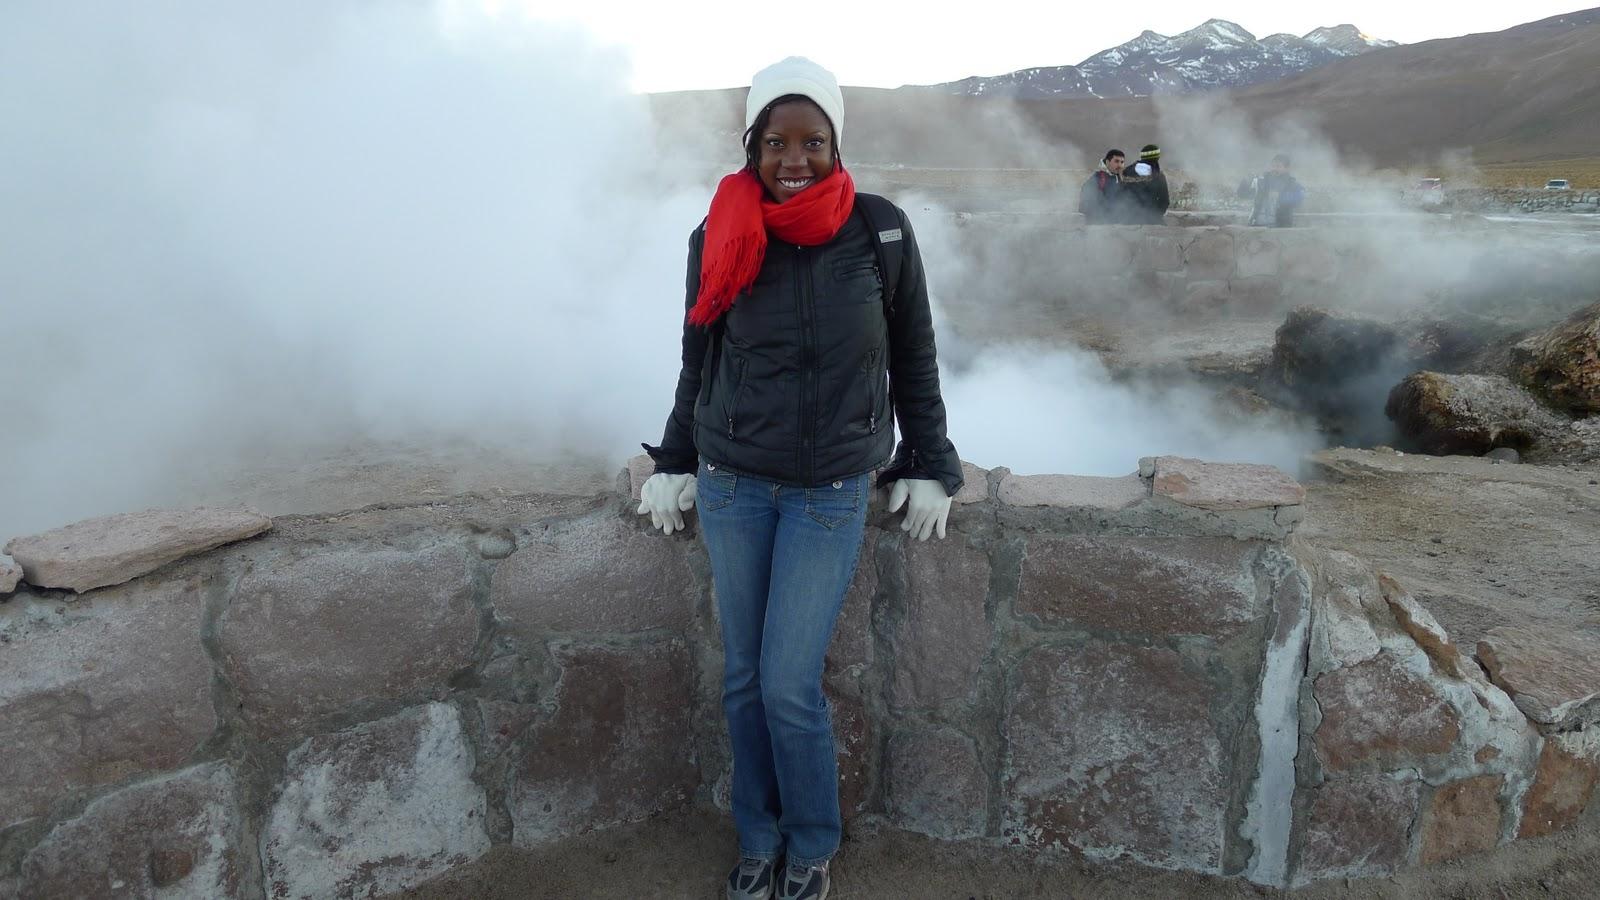 chile day 4 el tatio geyser and the llama dilemma oneika the traveller